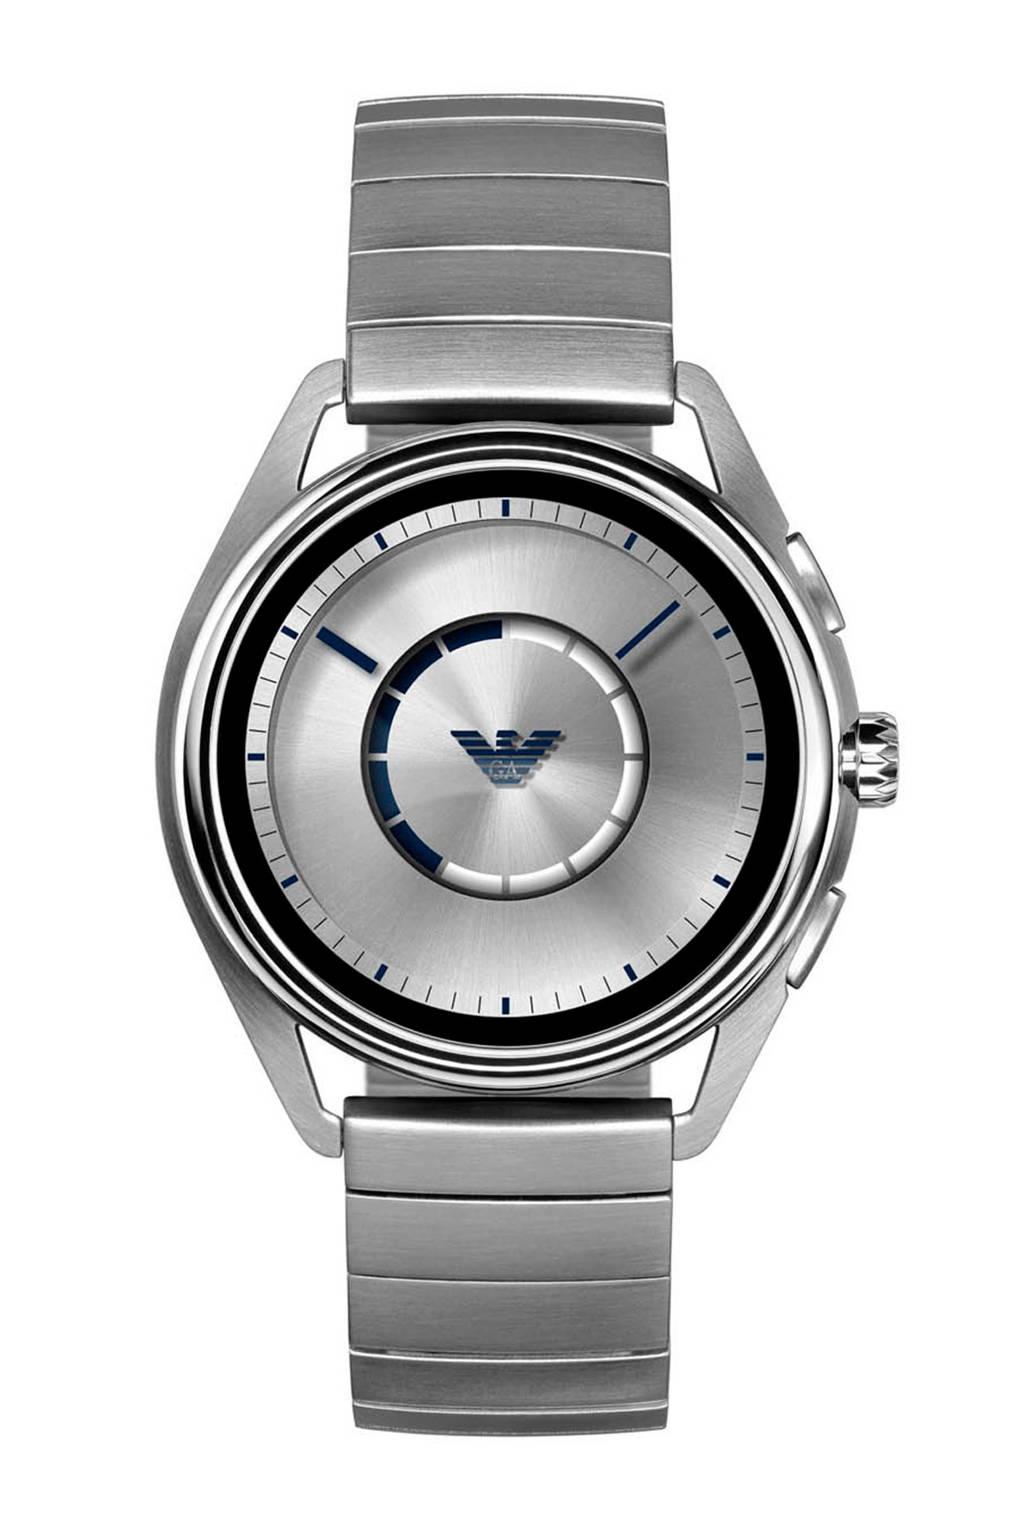 Emporio Armani Connected Matteo Gen 4 smartwatch ART5006, RVS